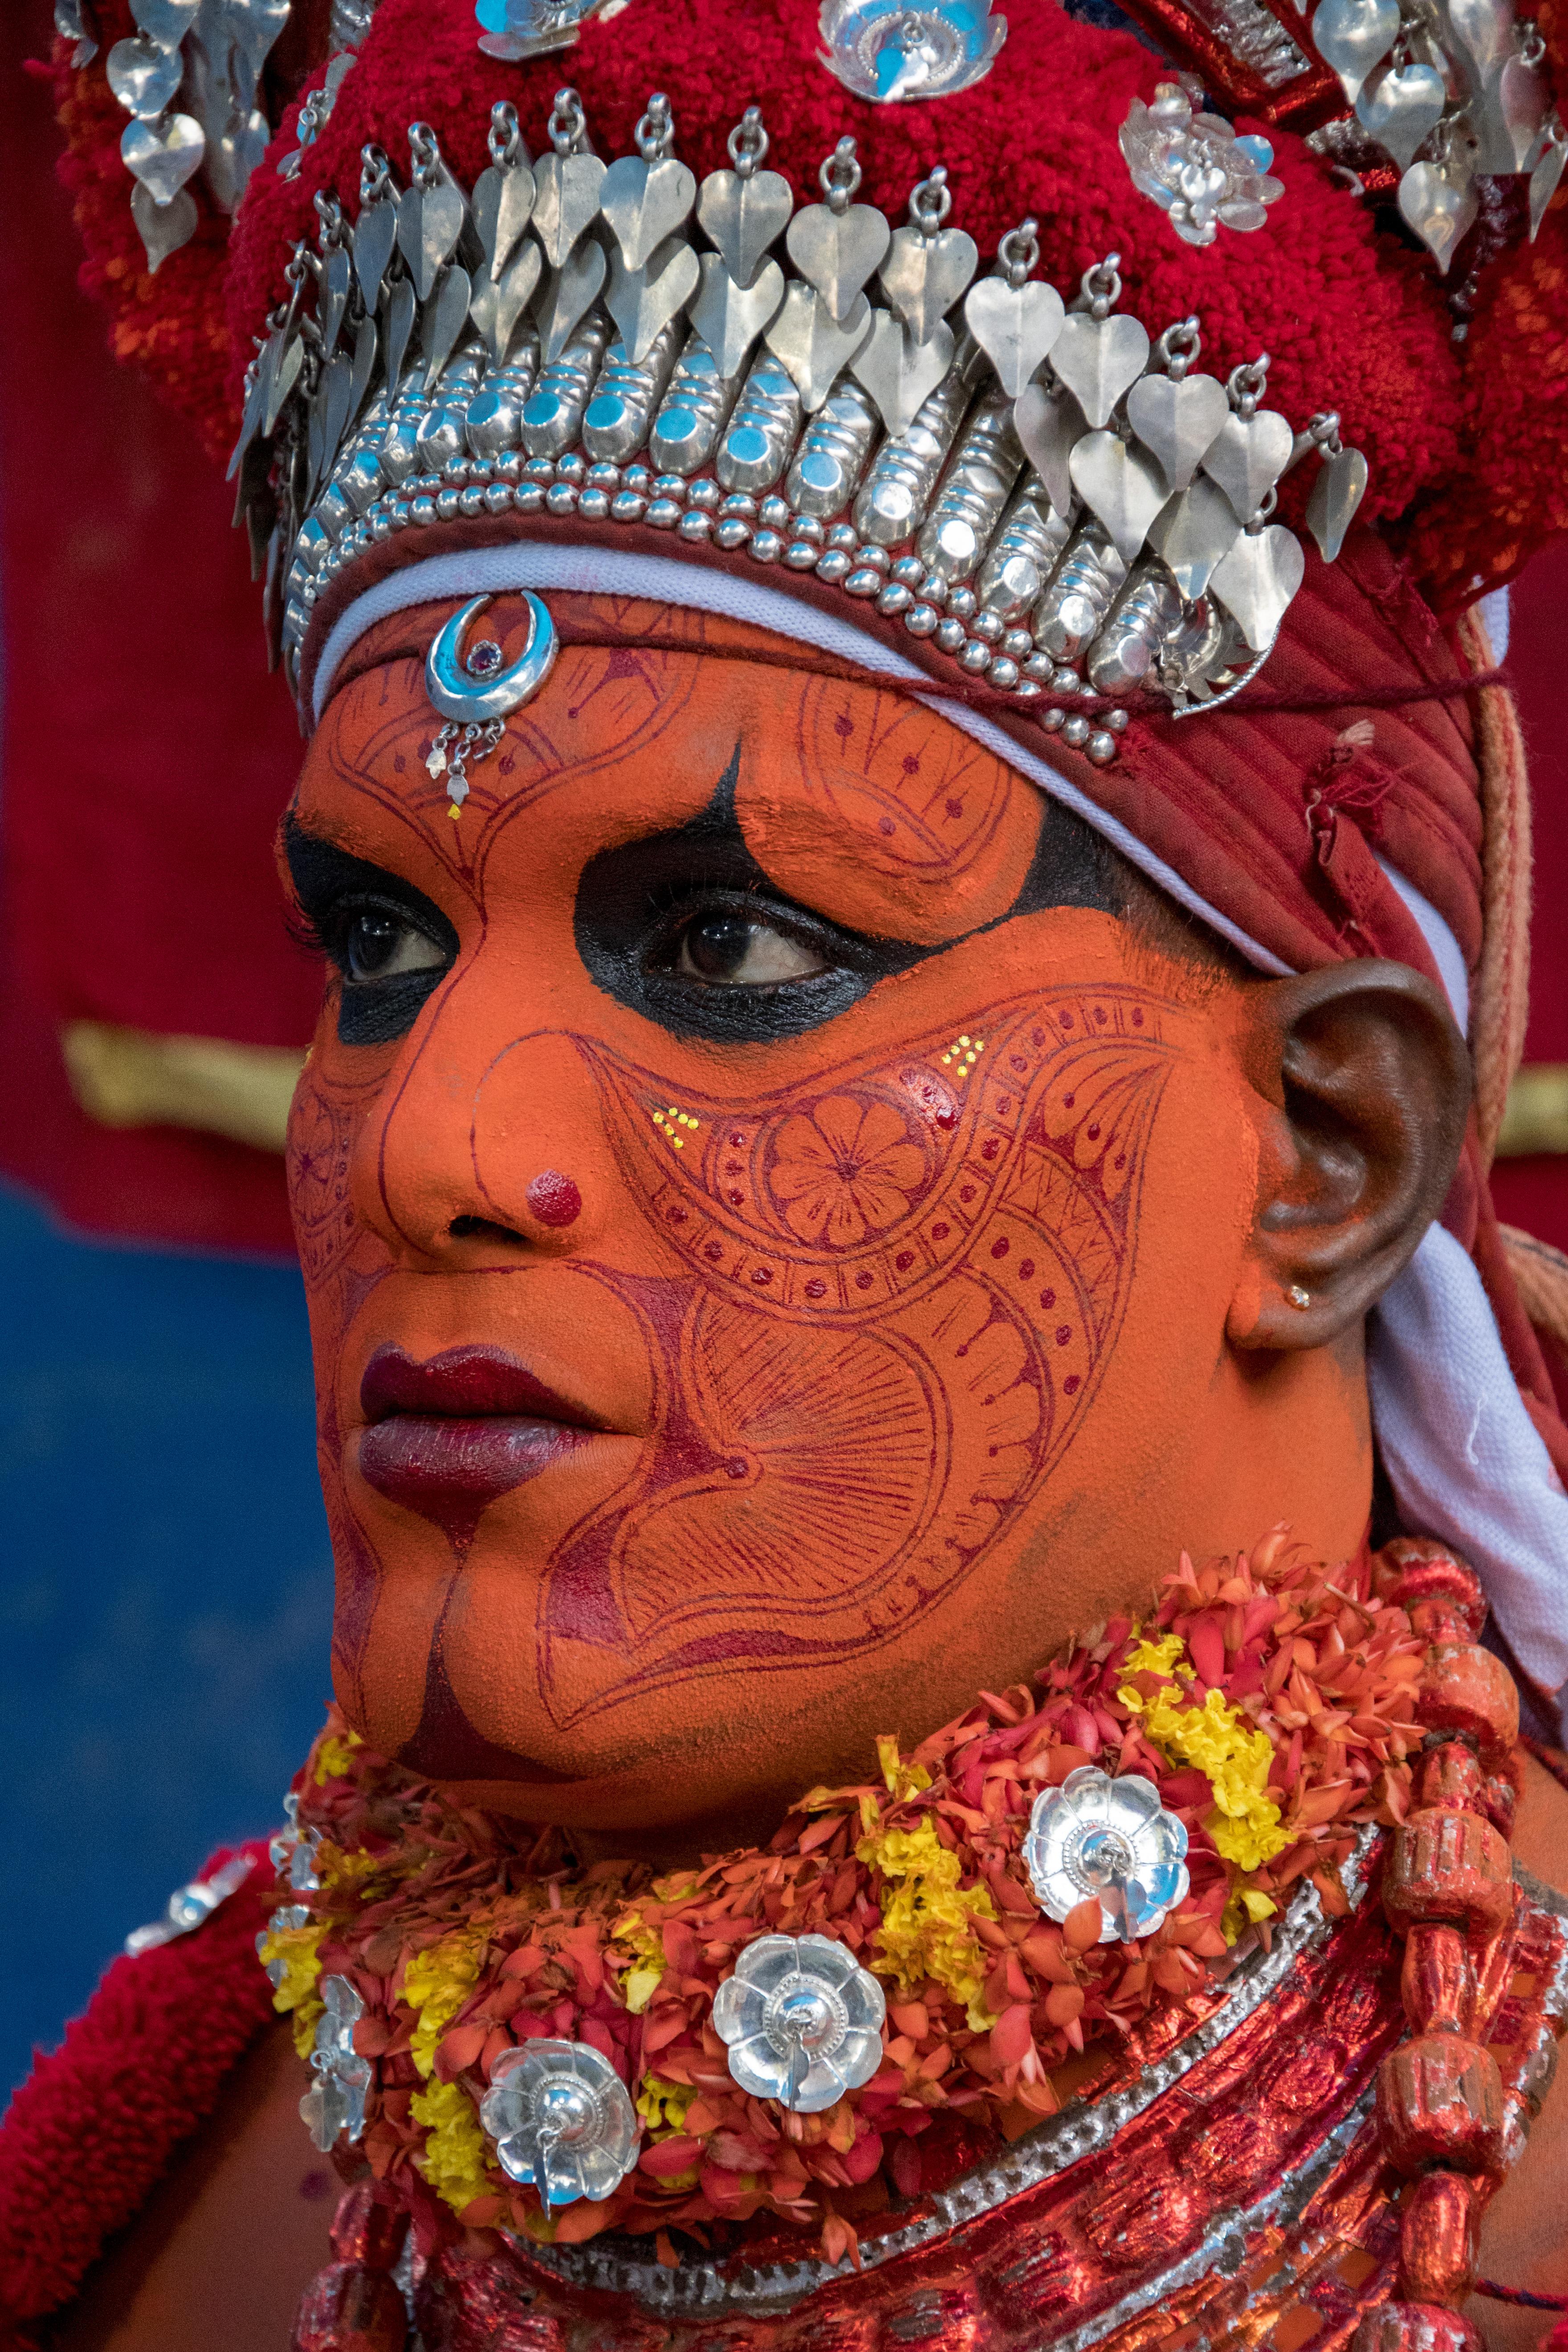 Theyyam make-up002.jpg Theyyam is a folk art of north kerala Date 1 April 2018, 07:12 Source Own work Author Shagil Kannur